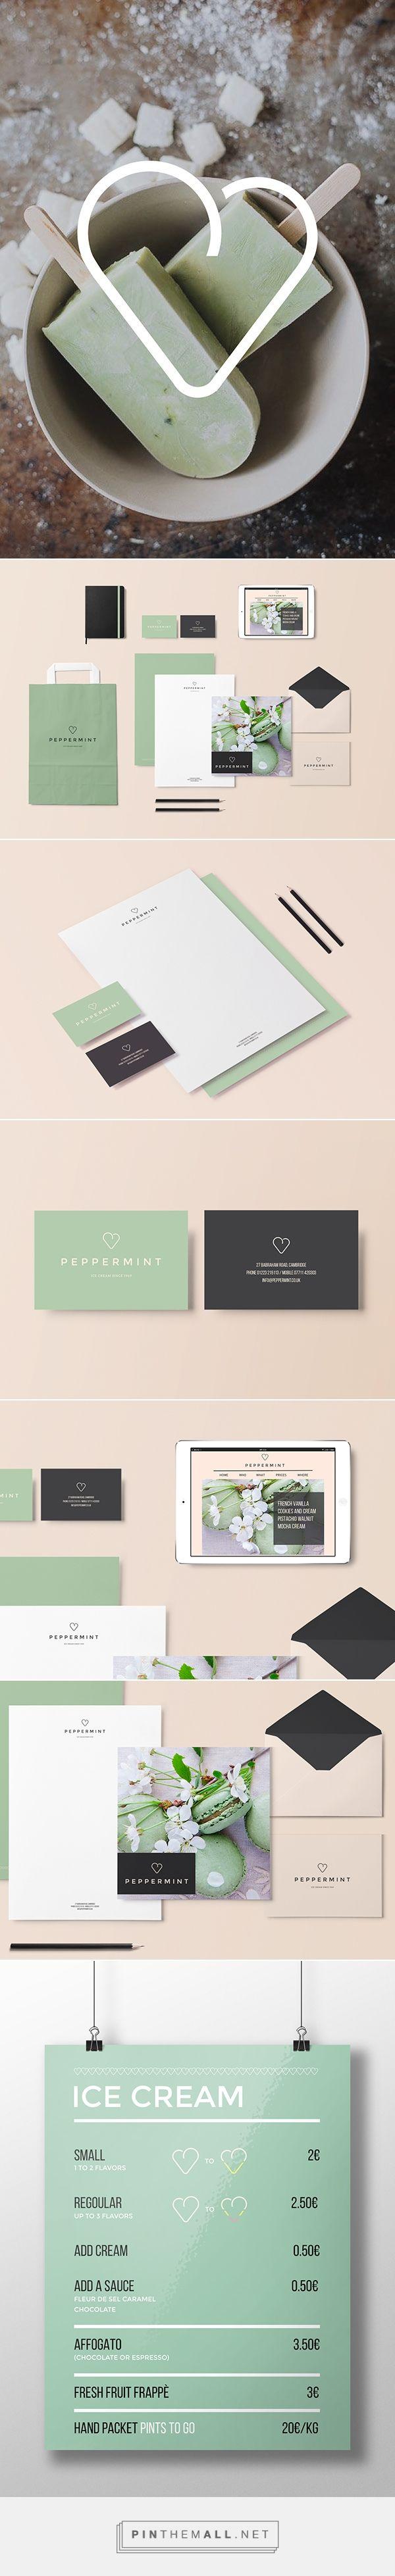 Peppermint Ice Cream Shop Branding by Papere Studio | Fivestar Branding – Design and Branding Agency & Inspiration Gallery